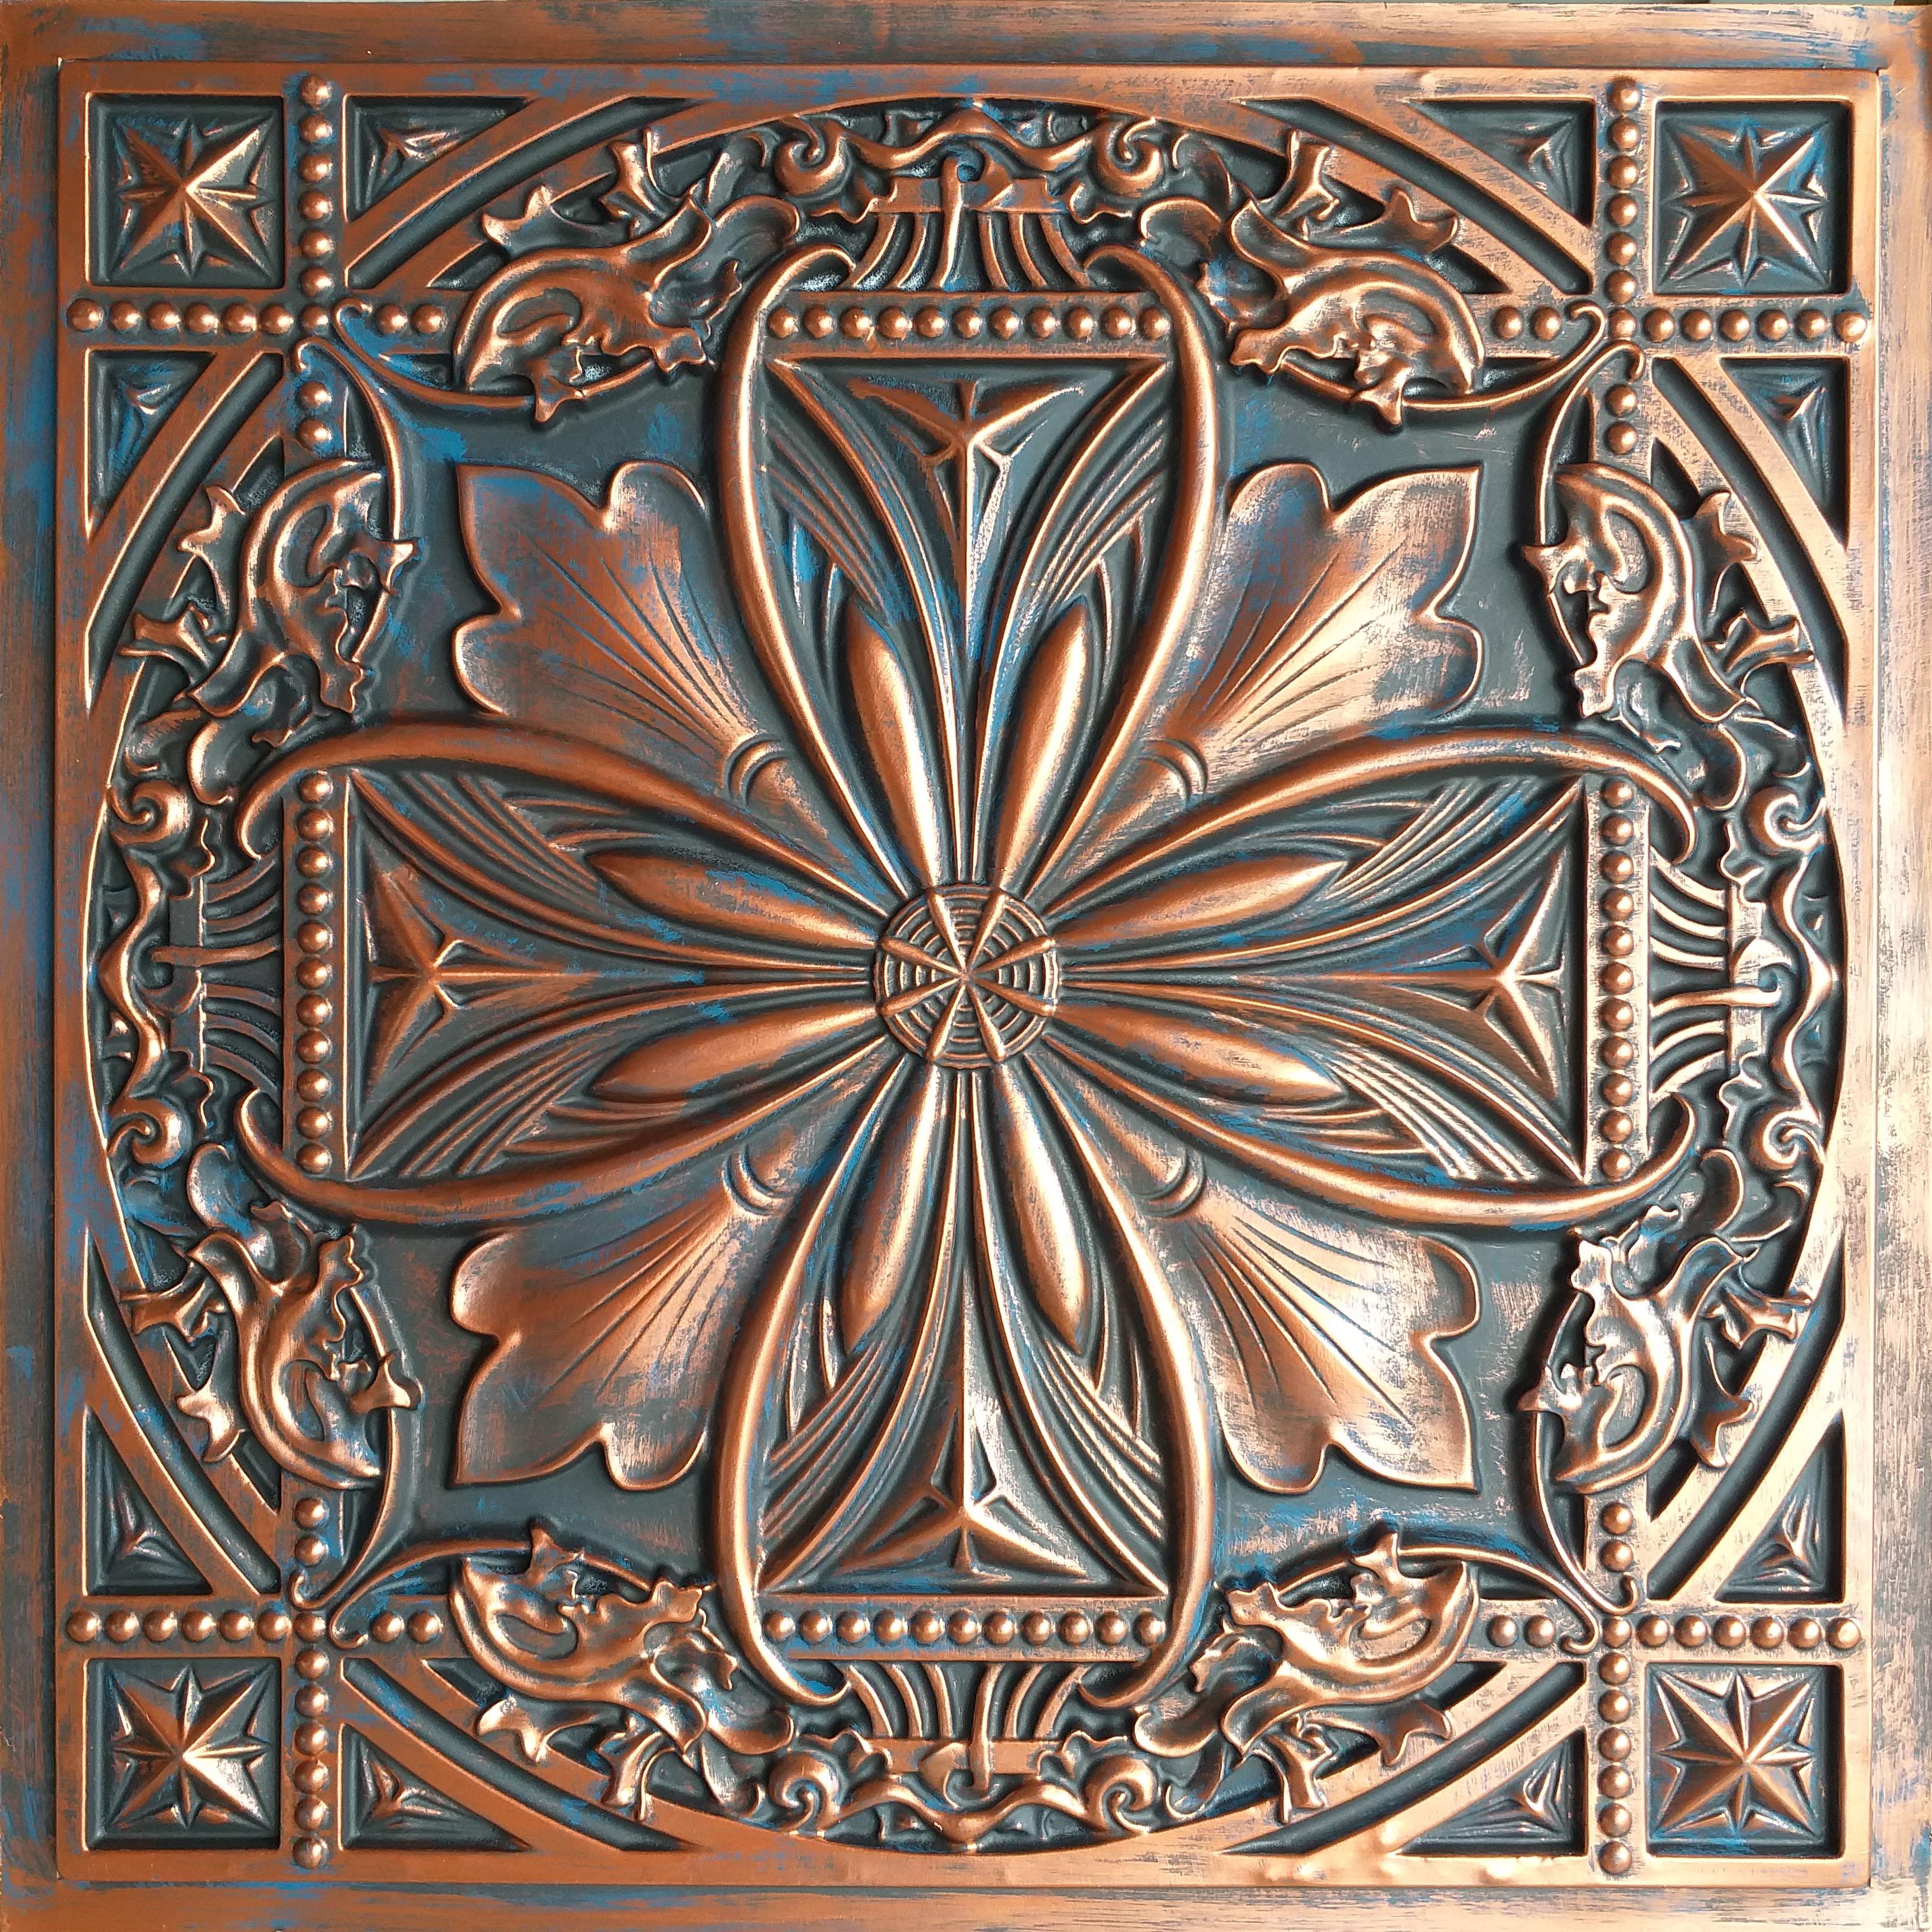 Tin Ceiling Tile Rustic Copper Color